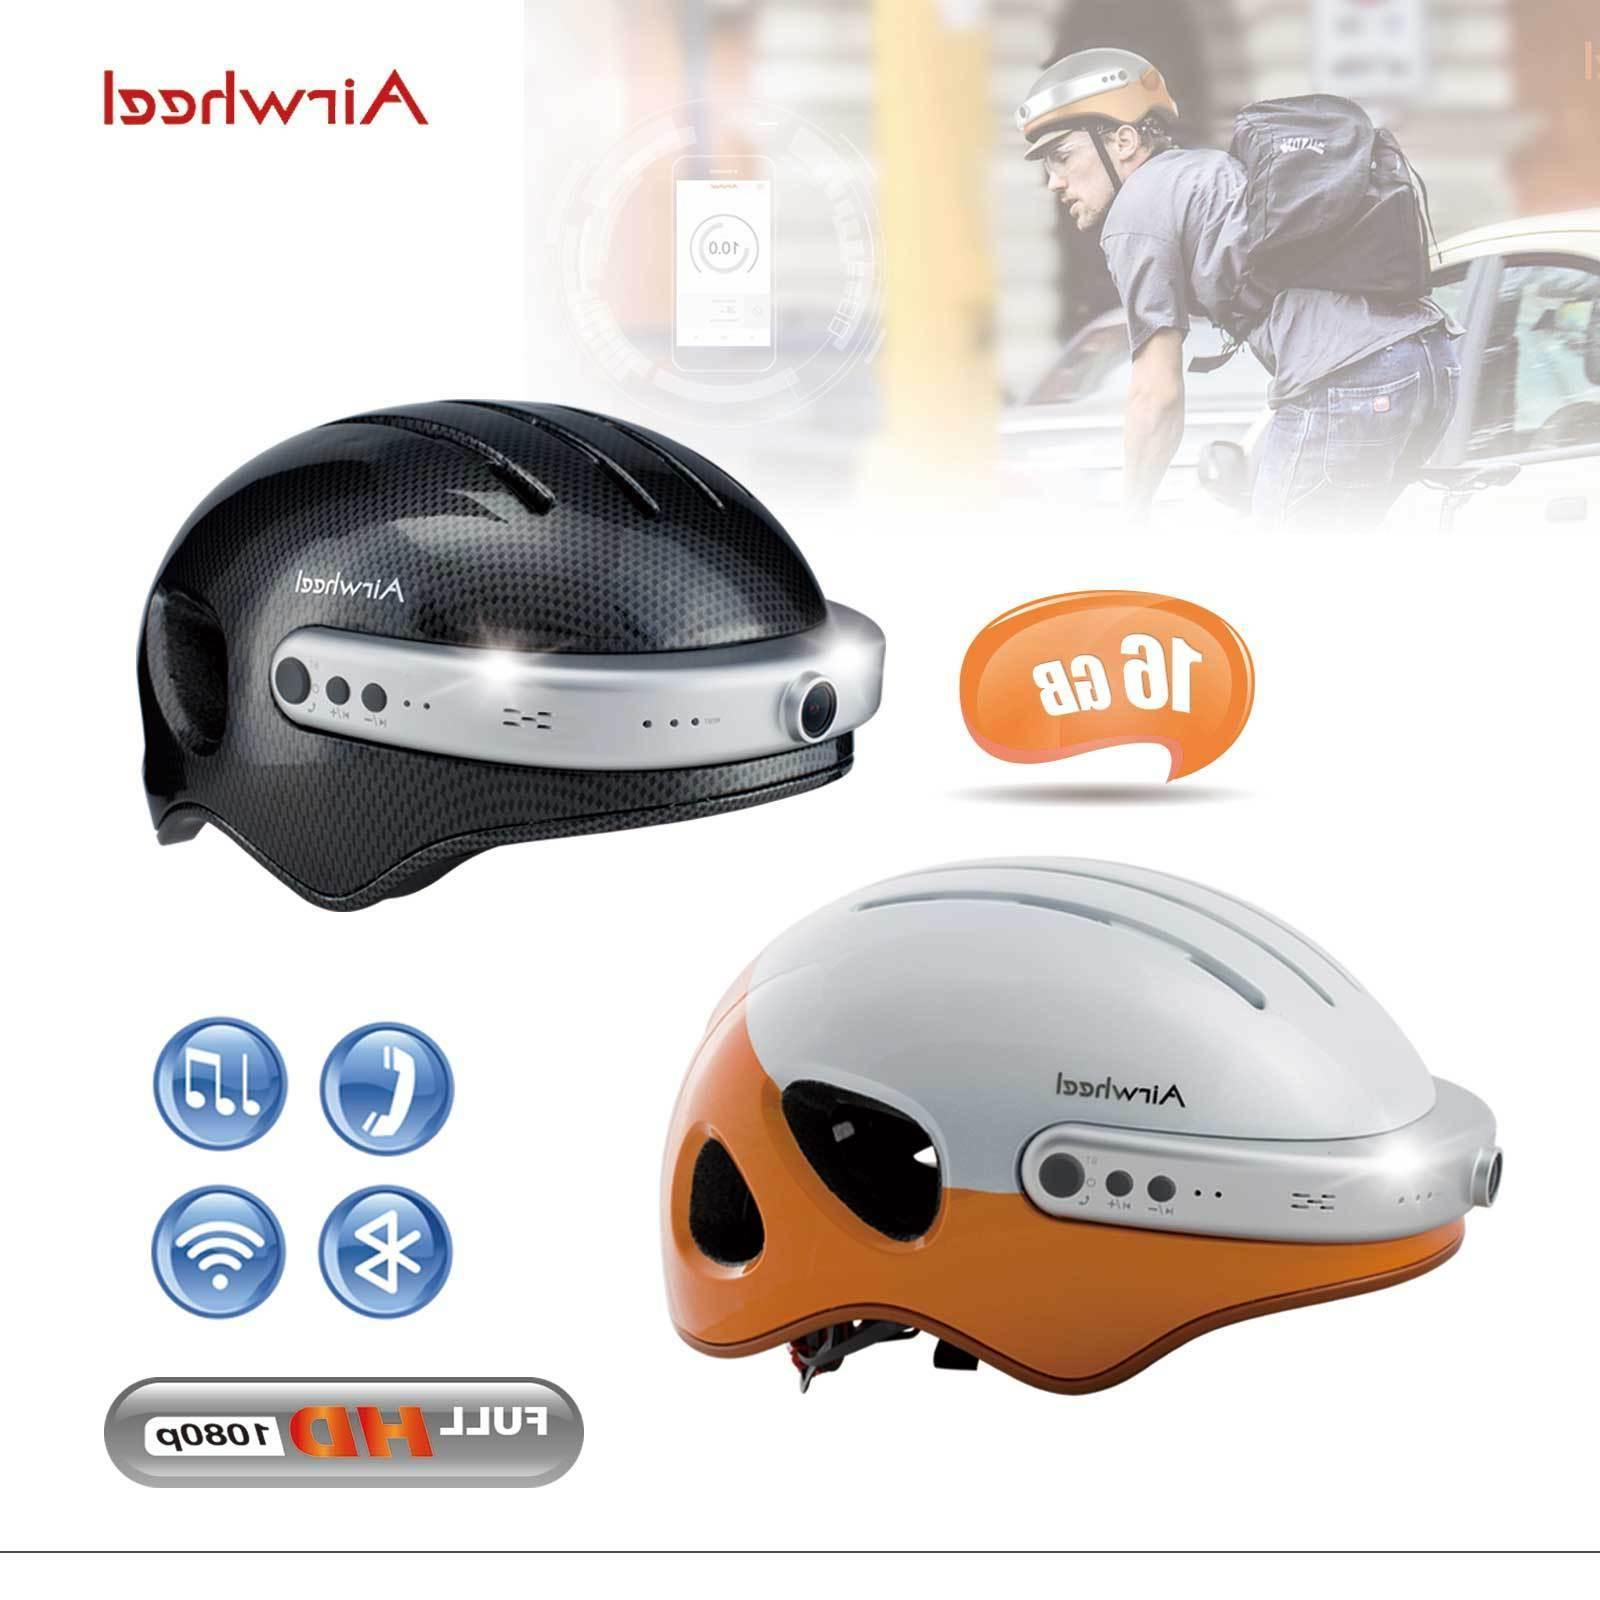 Cycling Bicycle Bike Motorcycle Unisex Men Women Adjustable Safety Helmet YR